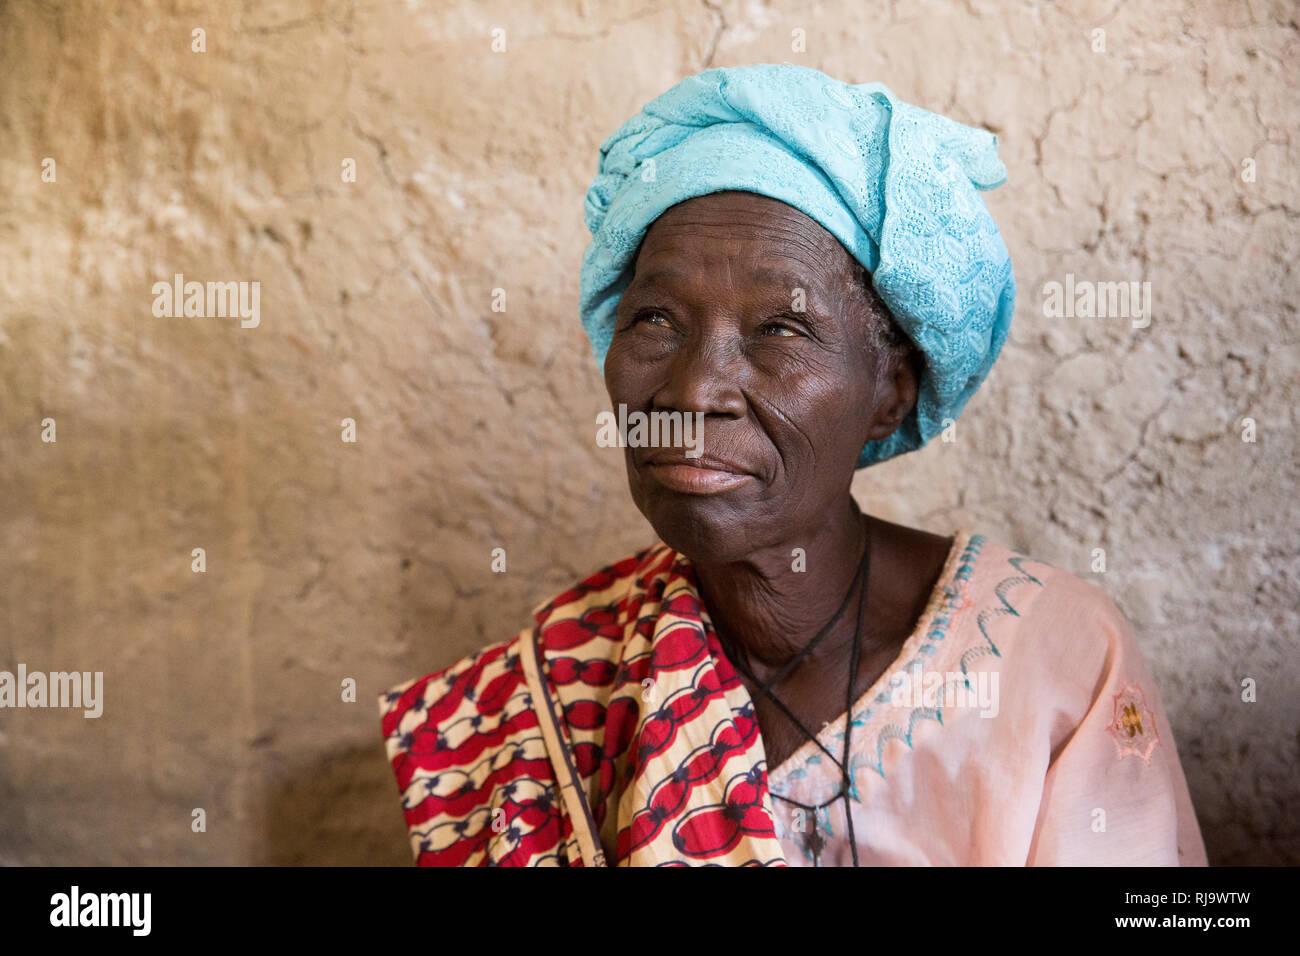 Baribsi village, Yako, Burkina Faso, 30th November 2016; Kazengou Bazengbamaric who has 30 shea trees and planted 200 shea seeds for the next generation. Stock Photo